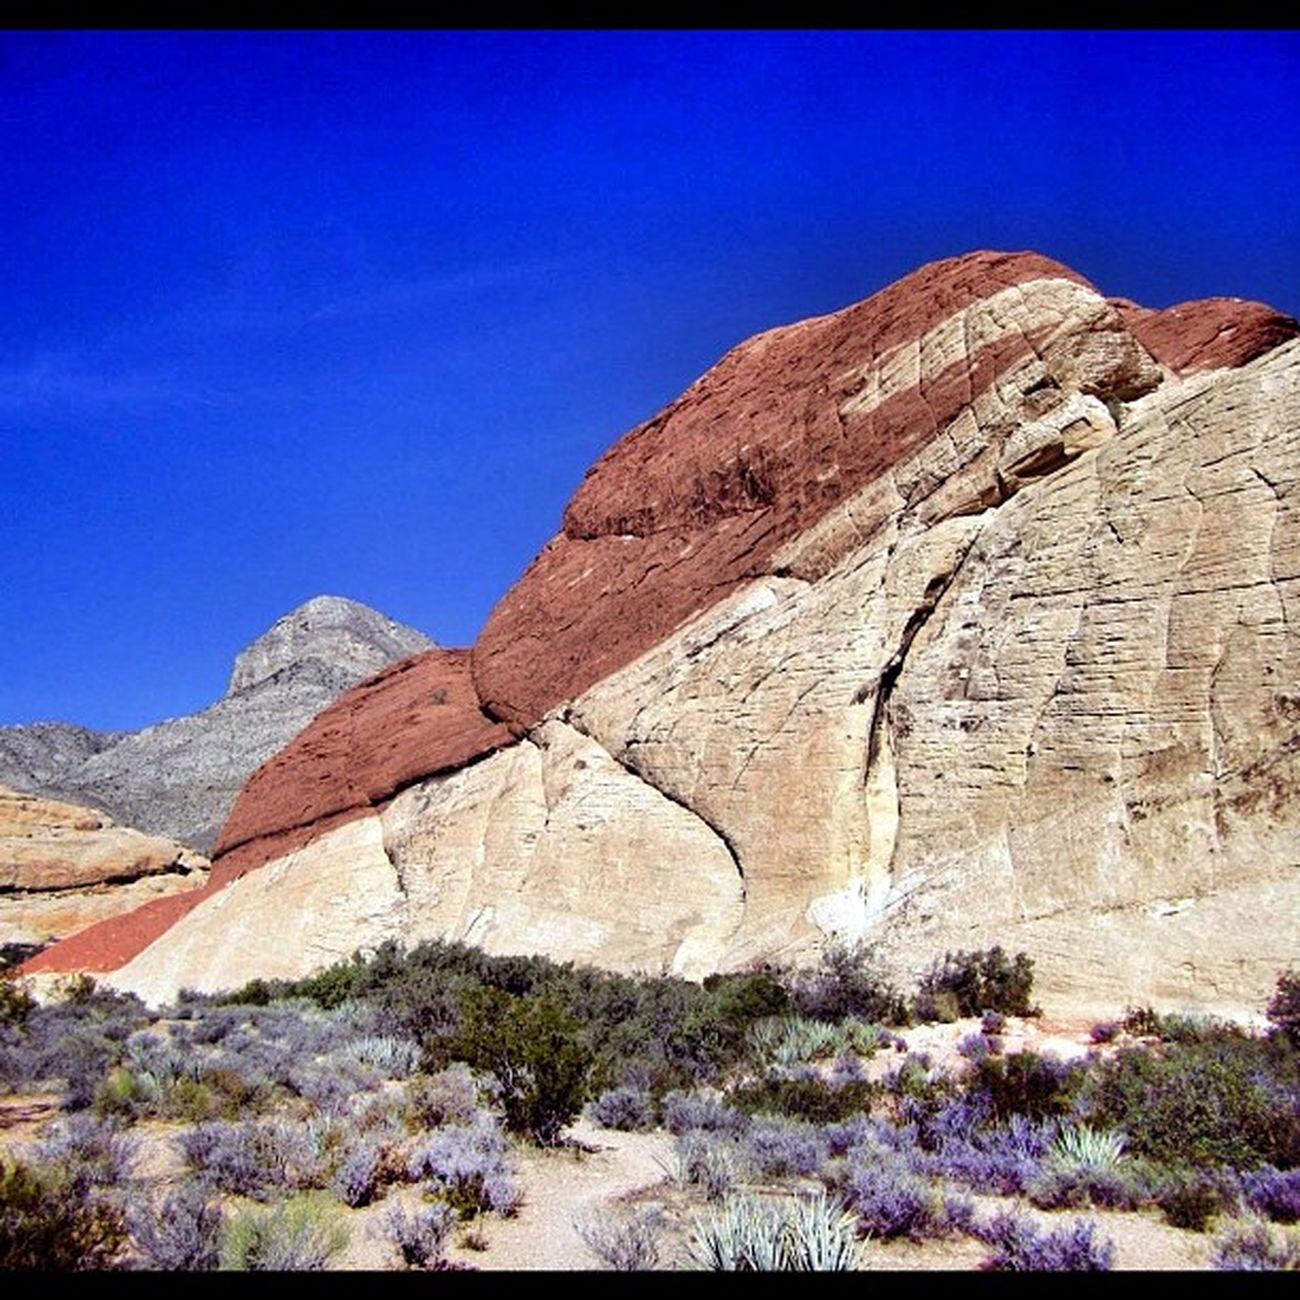 Red Rock Canyon #redrock #canyon #outdoors #desert #nevada #lasvegas #rock #wilderness #usa #travel #honktravel Desert Travel USA Outdoors Rock Wilderness Nevada Canyon Redrock Lasvegas Honktravel